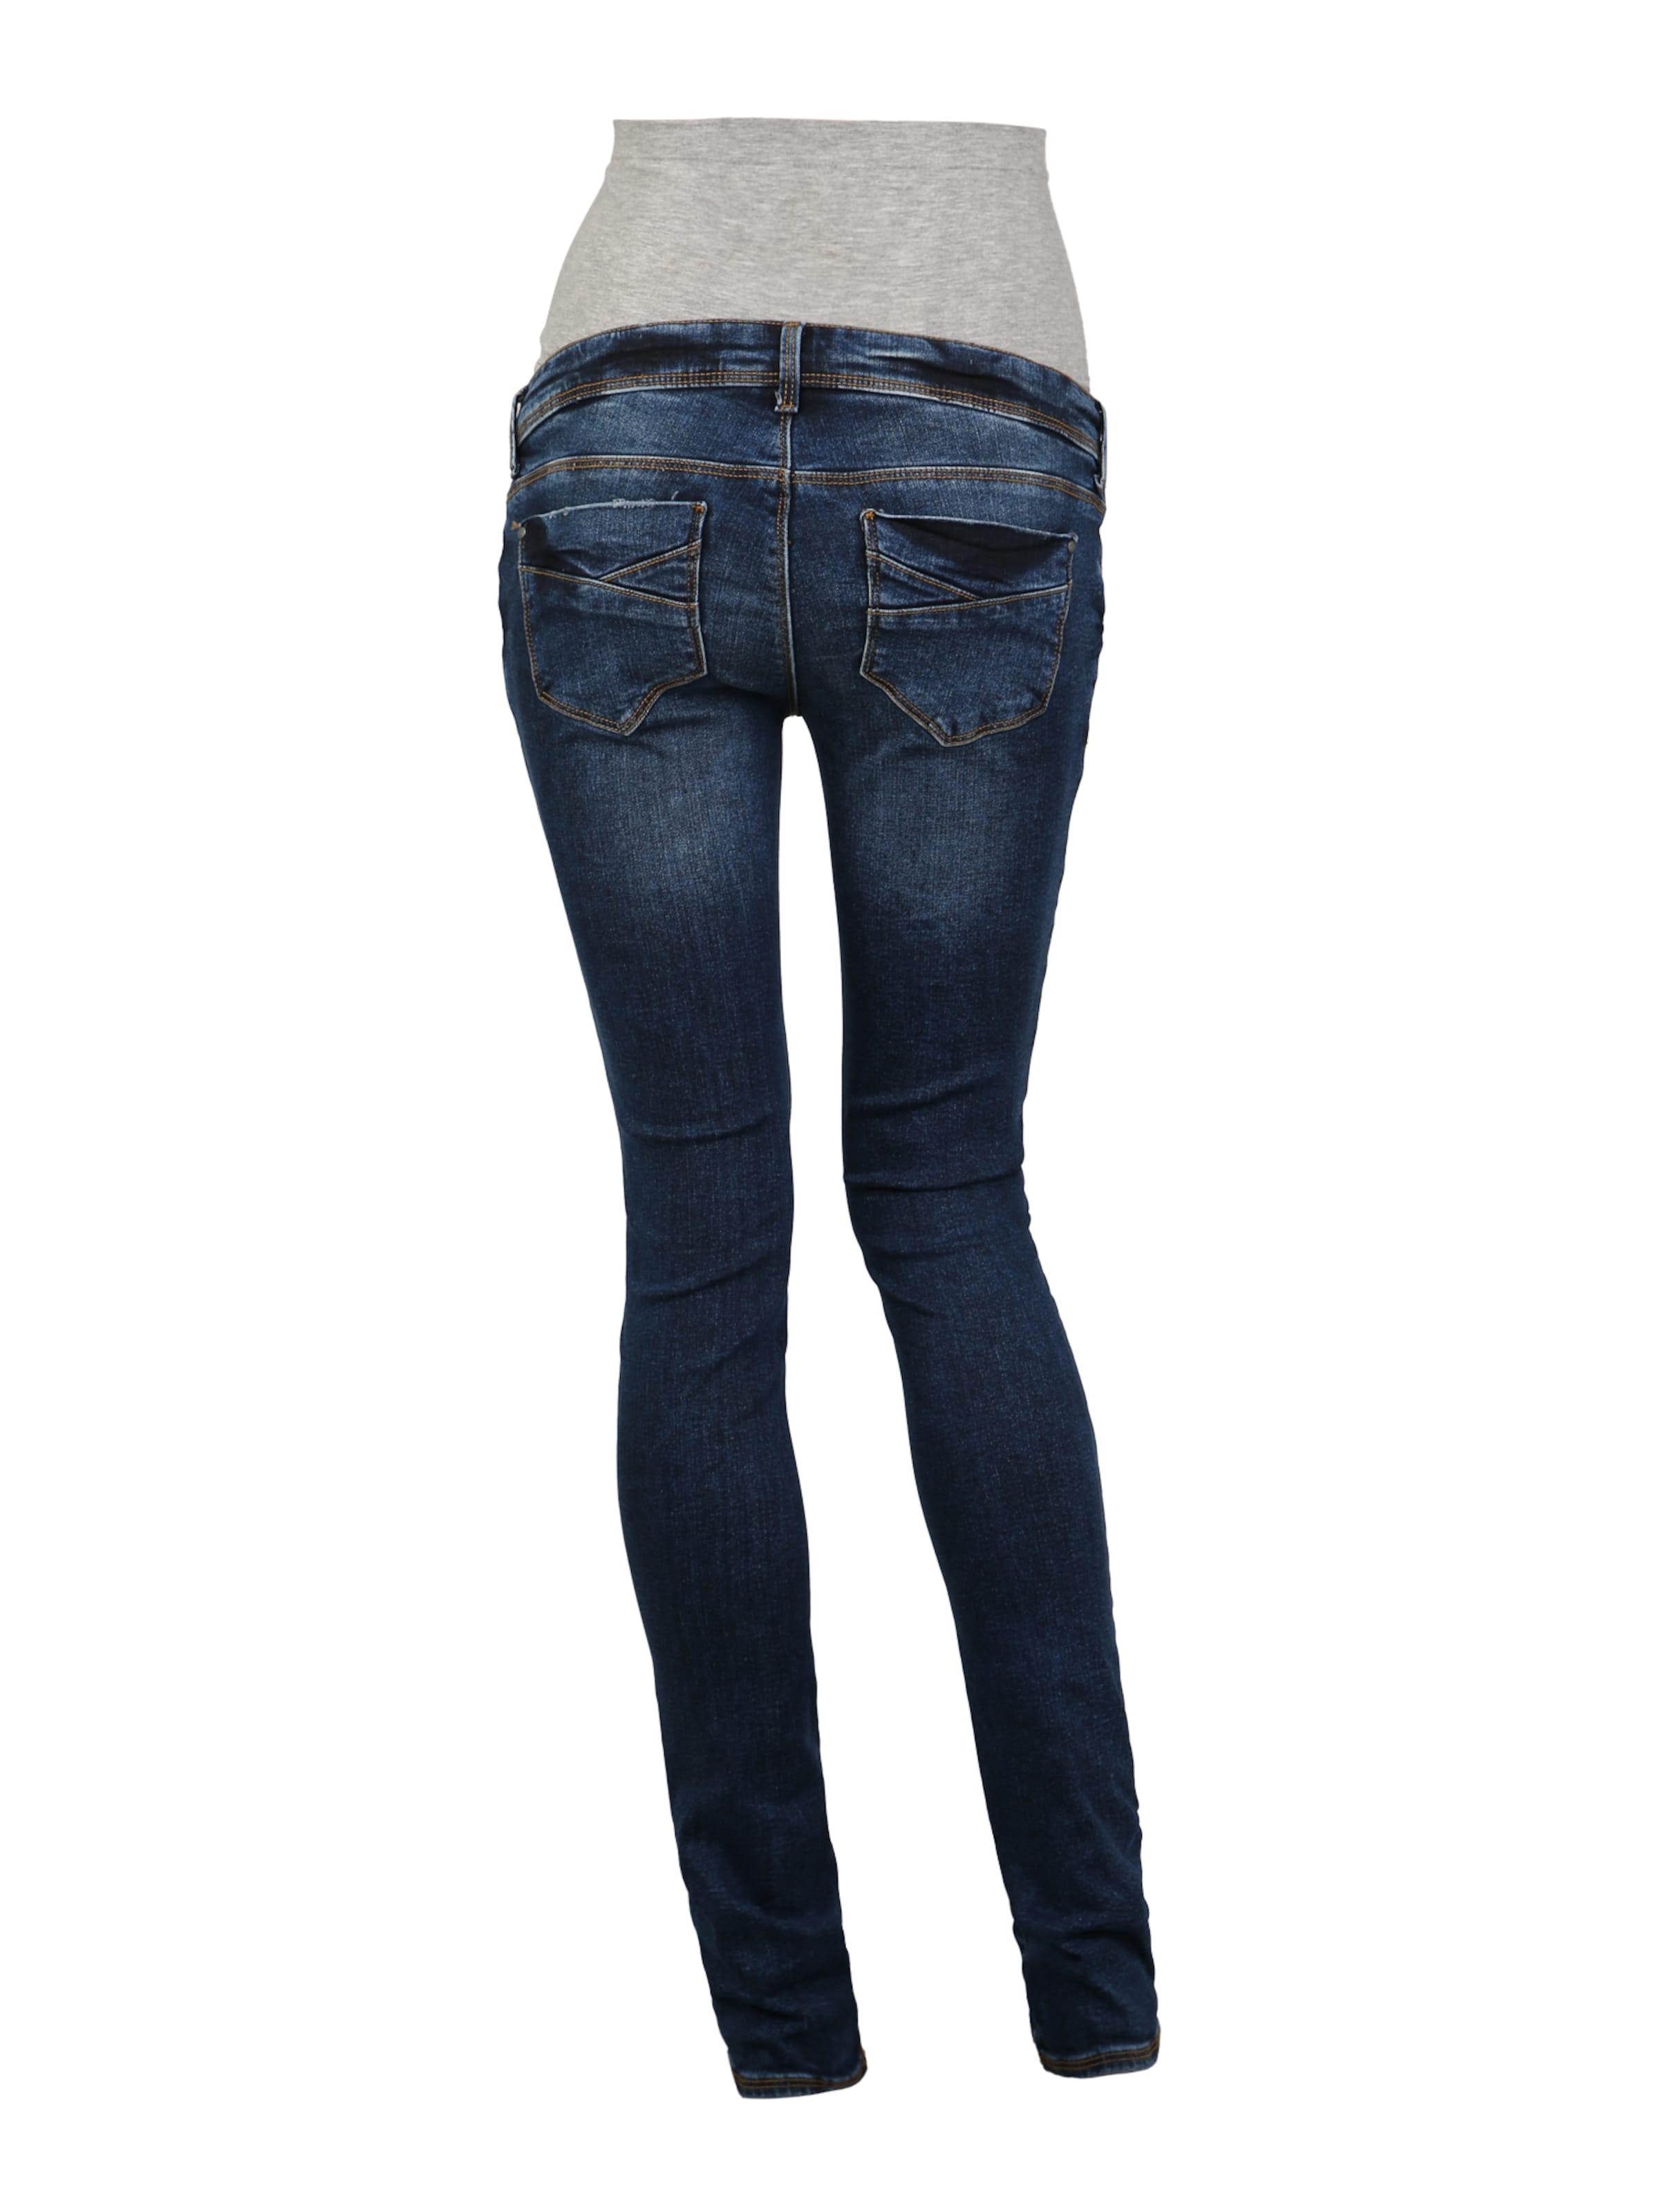 'ohio' Mamalicious Jeans Blue In Denim tCQhxsrd